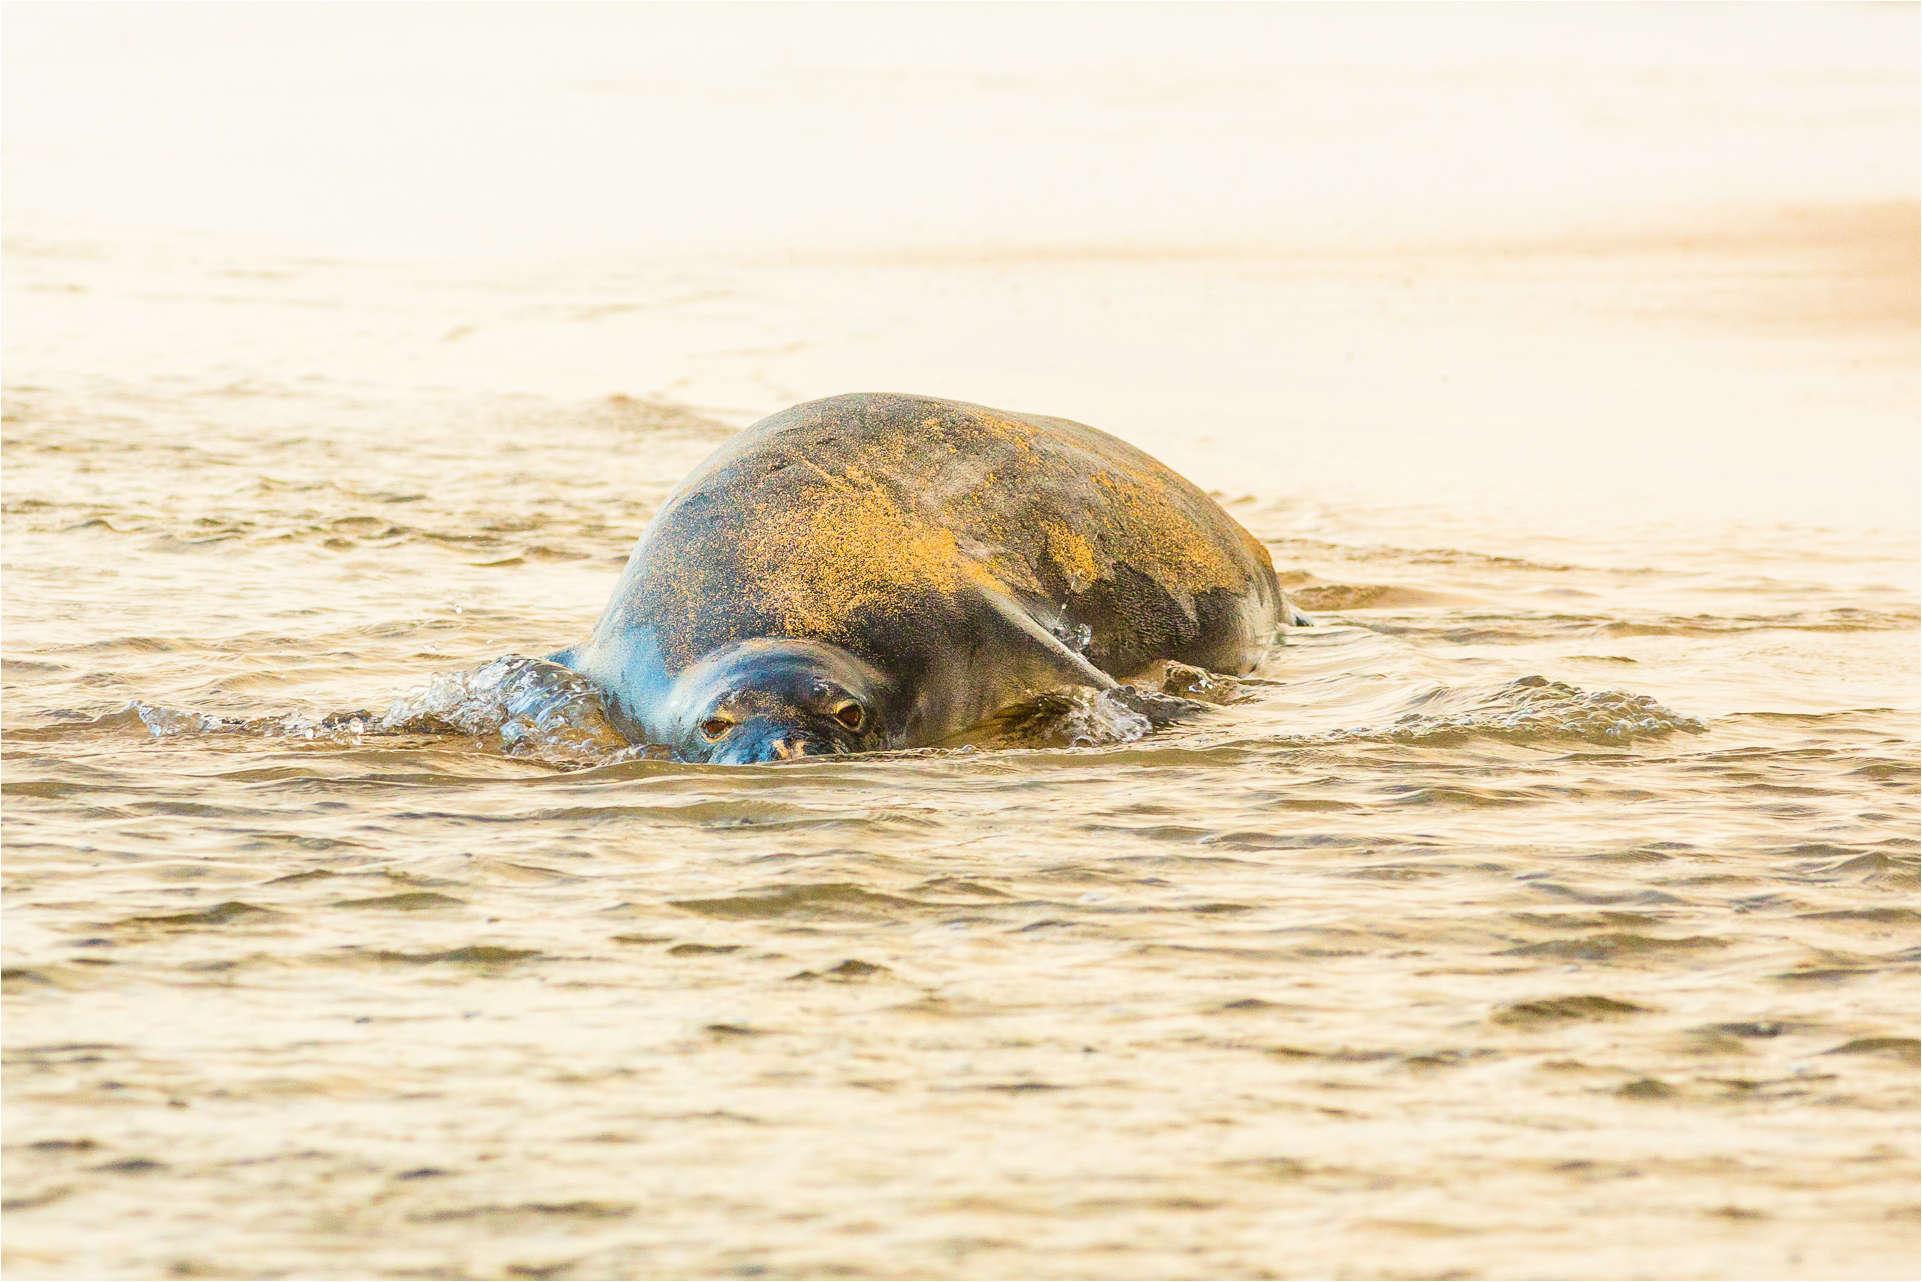 Monk Seal peek-a-boo - © Christopher Martin-2821